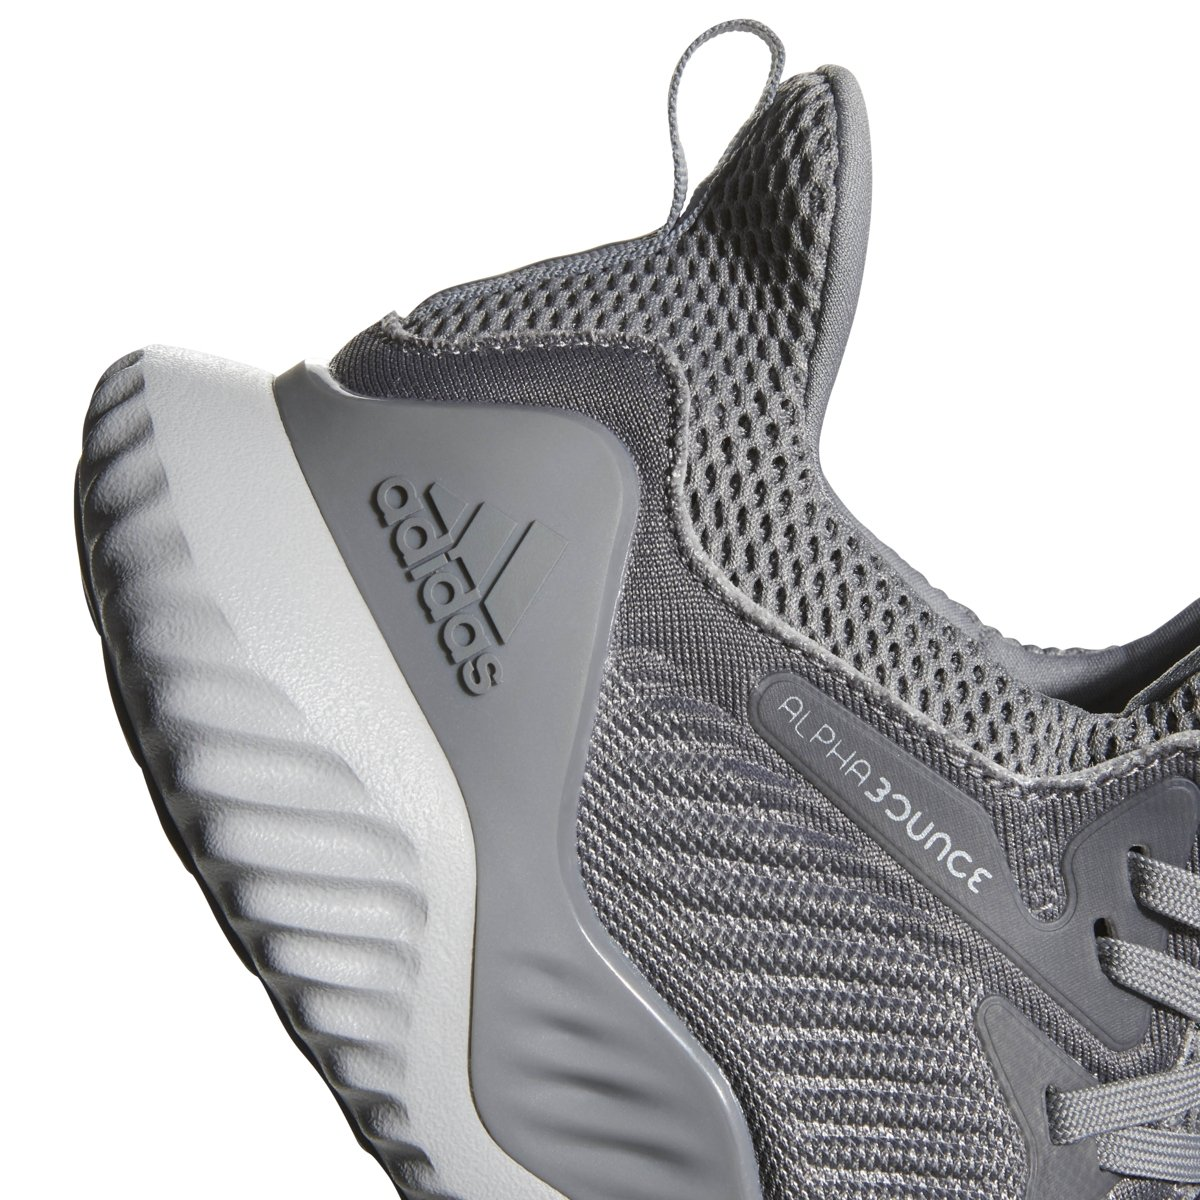 Zapatillas W, de Beyond running adidas Alphabounce corriendo Beyond uno W, Alphabounce para 3fcb49a - hotlink.pw